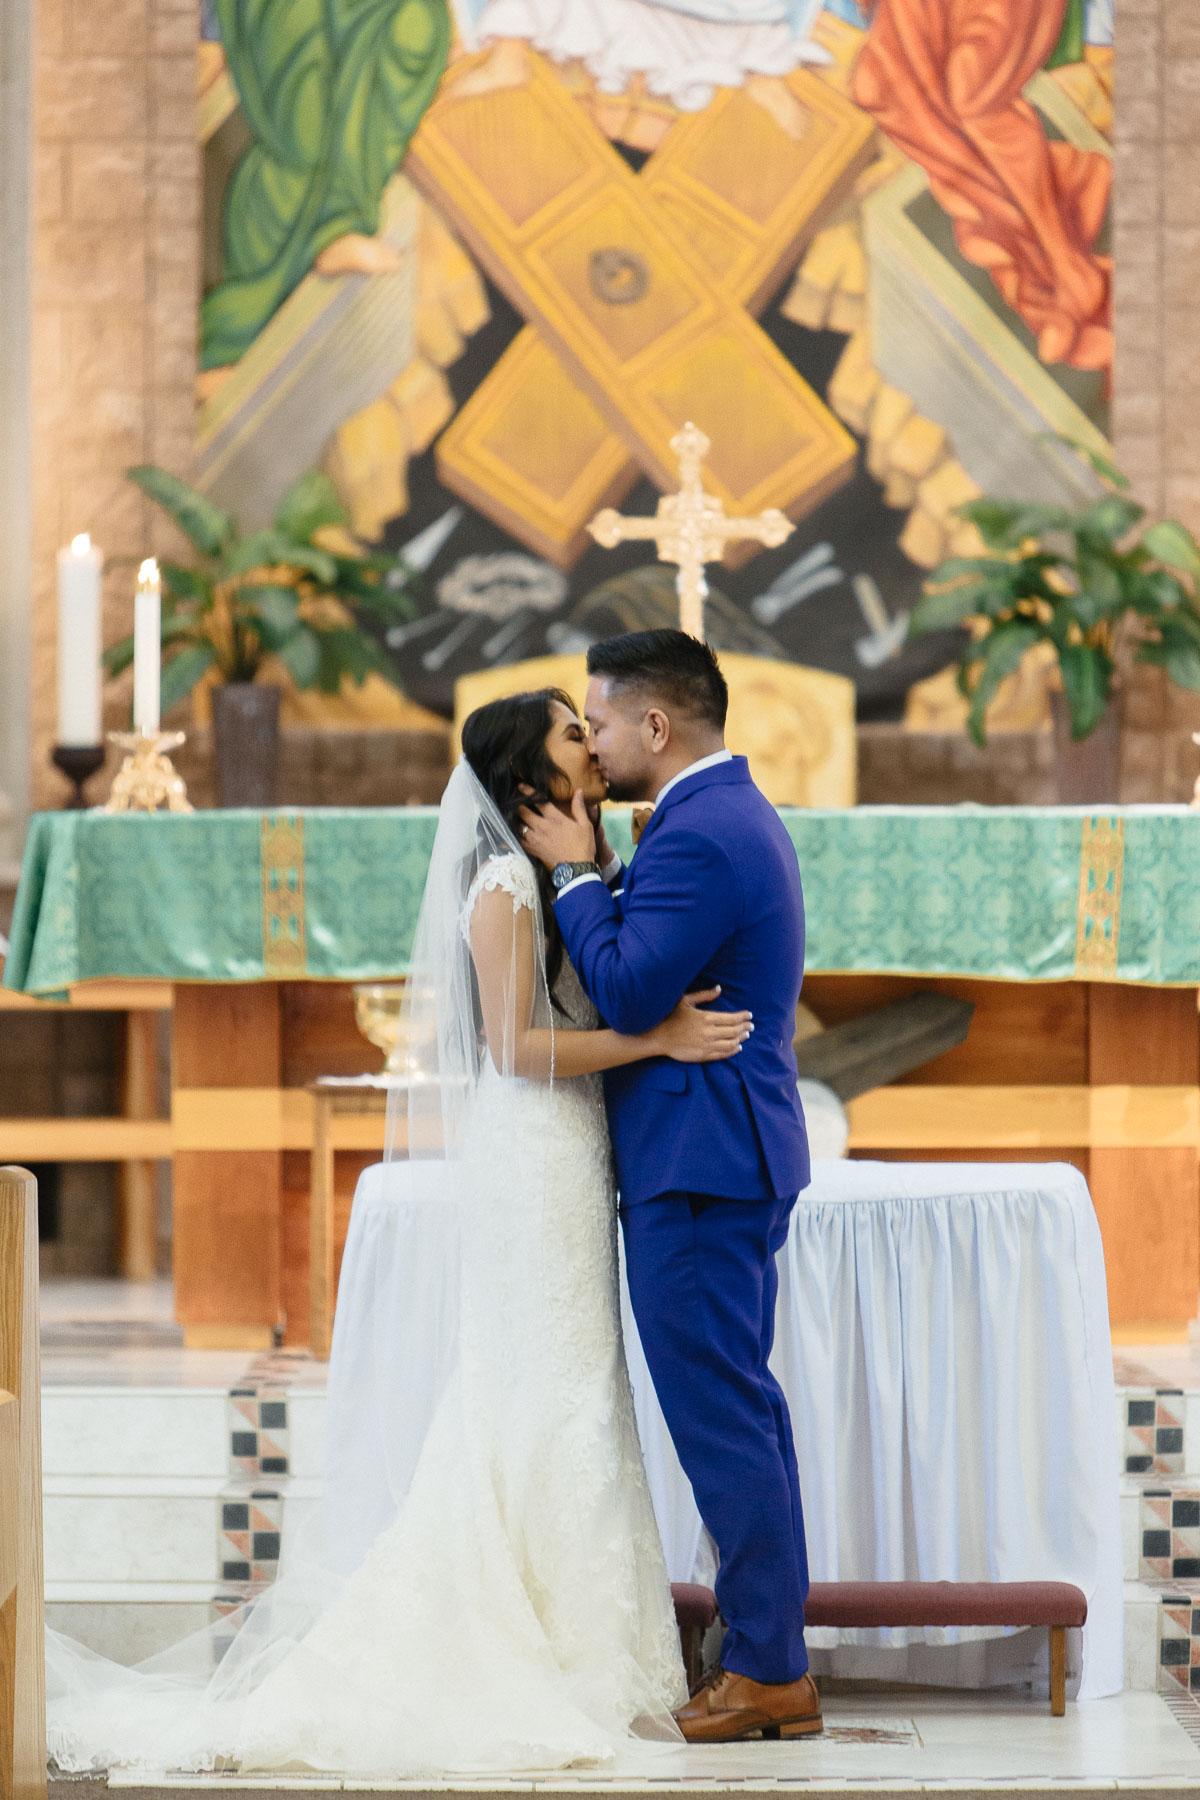 161029-Luxium-Weddings-Arizona-Jeff-Griselda-First-Look-Val-Vista-Lakes-Gilber-043.jpg